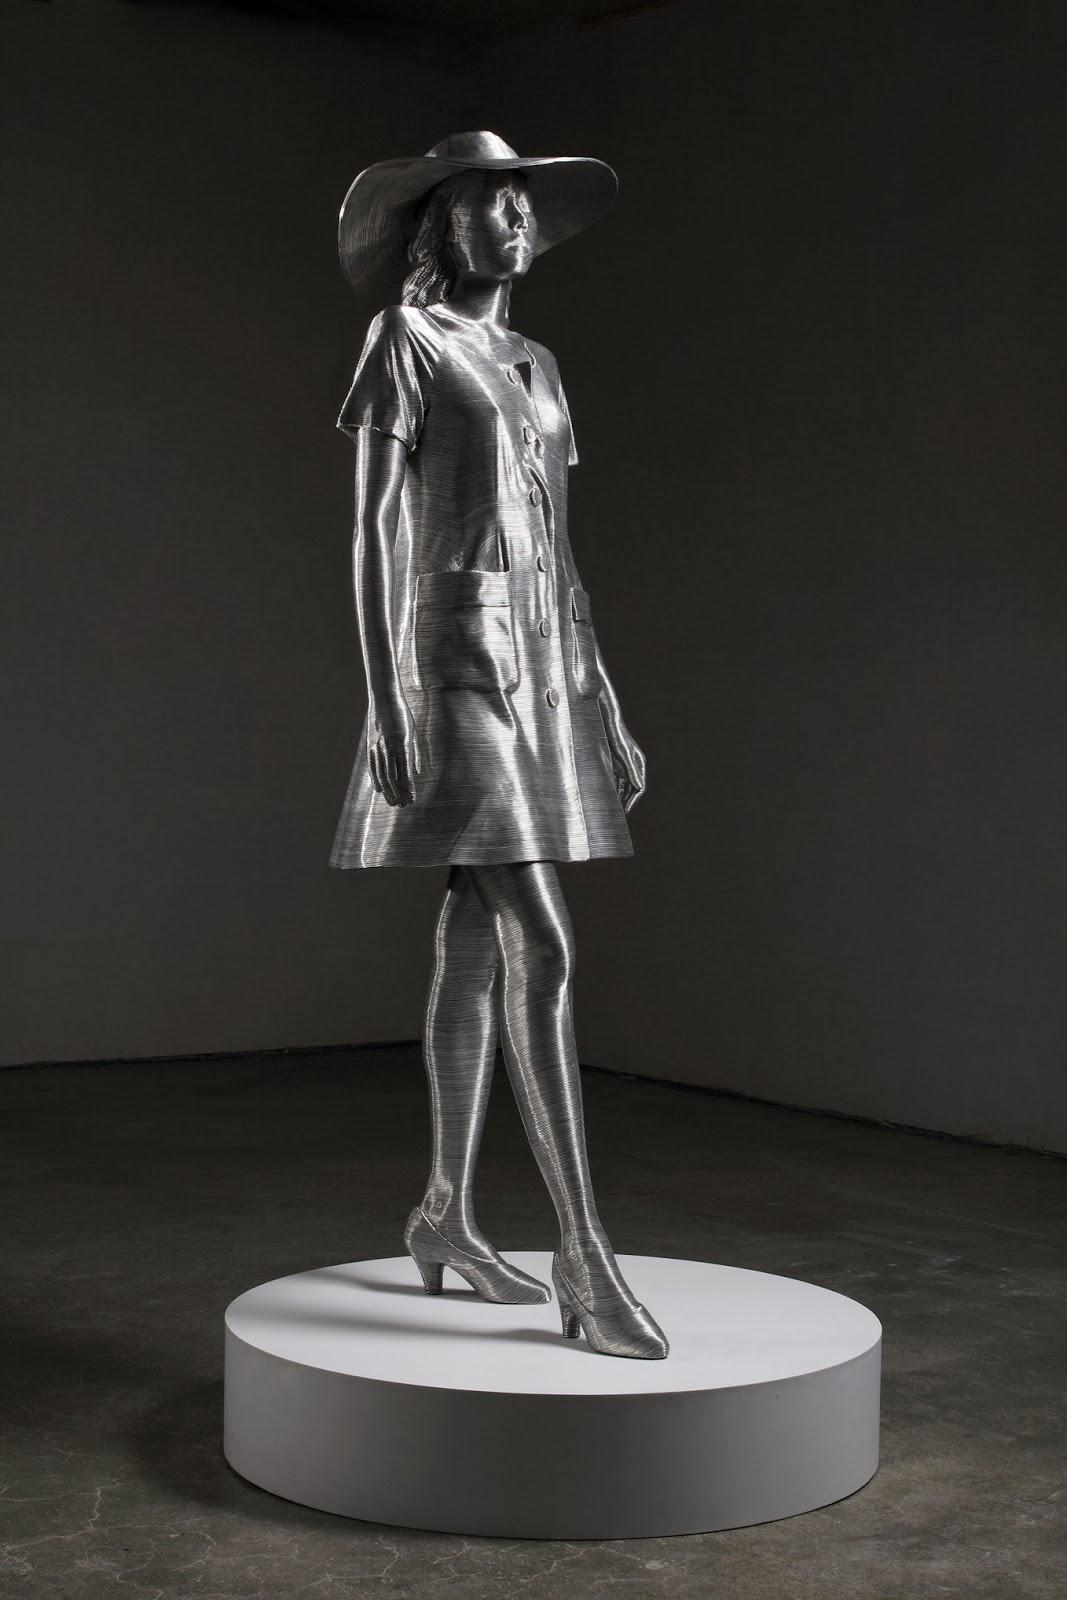 09-Park-Seung-Mo-South-Korean-Artist-&-Sculptor-Wire-Sculpture-www-designstack-co